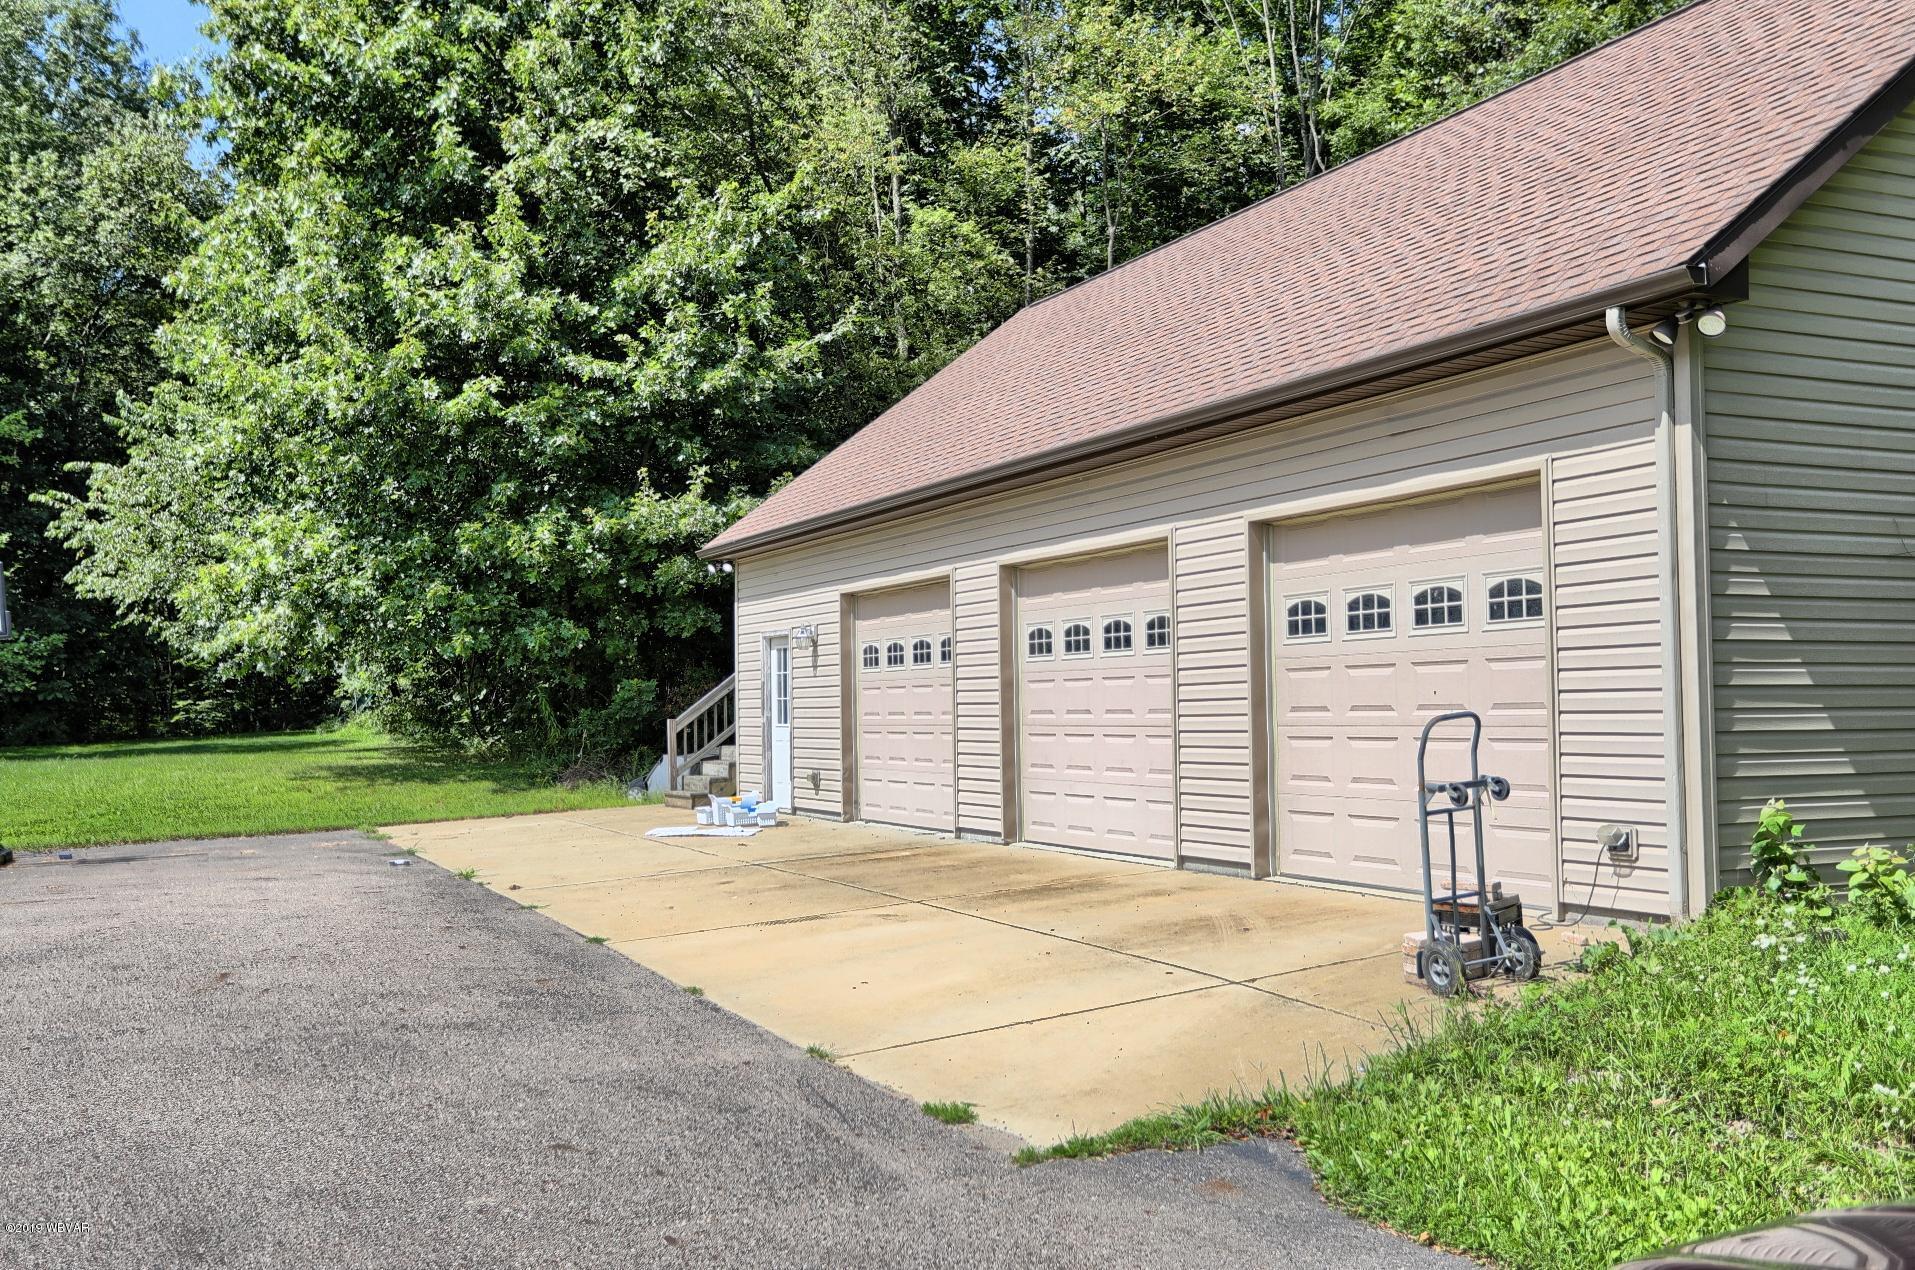 11549 SPERRY ROAD,Atlantic,PA 16111,3 Bedrooms Bedrooms,2 BathroomsBathrooms,Farm,SPERRY,WB-88508